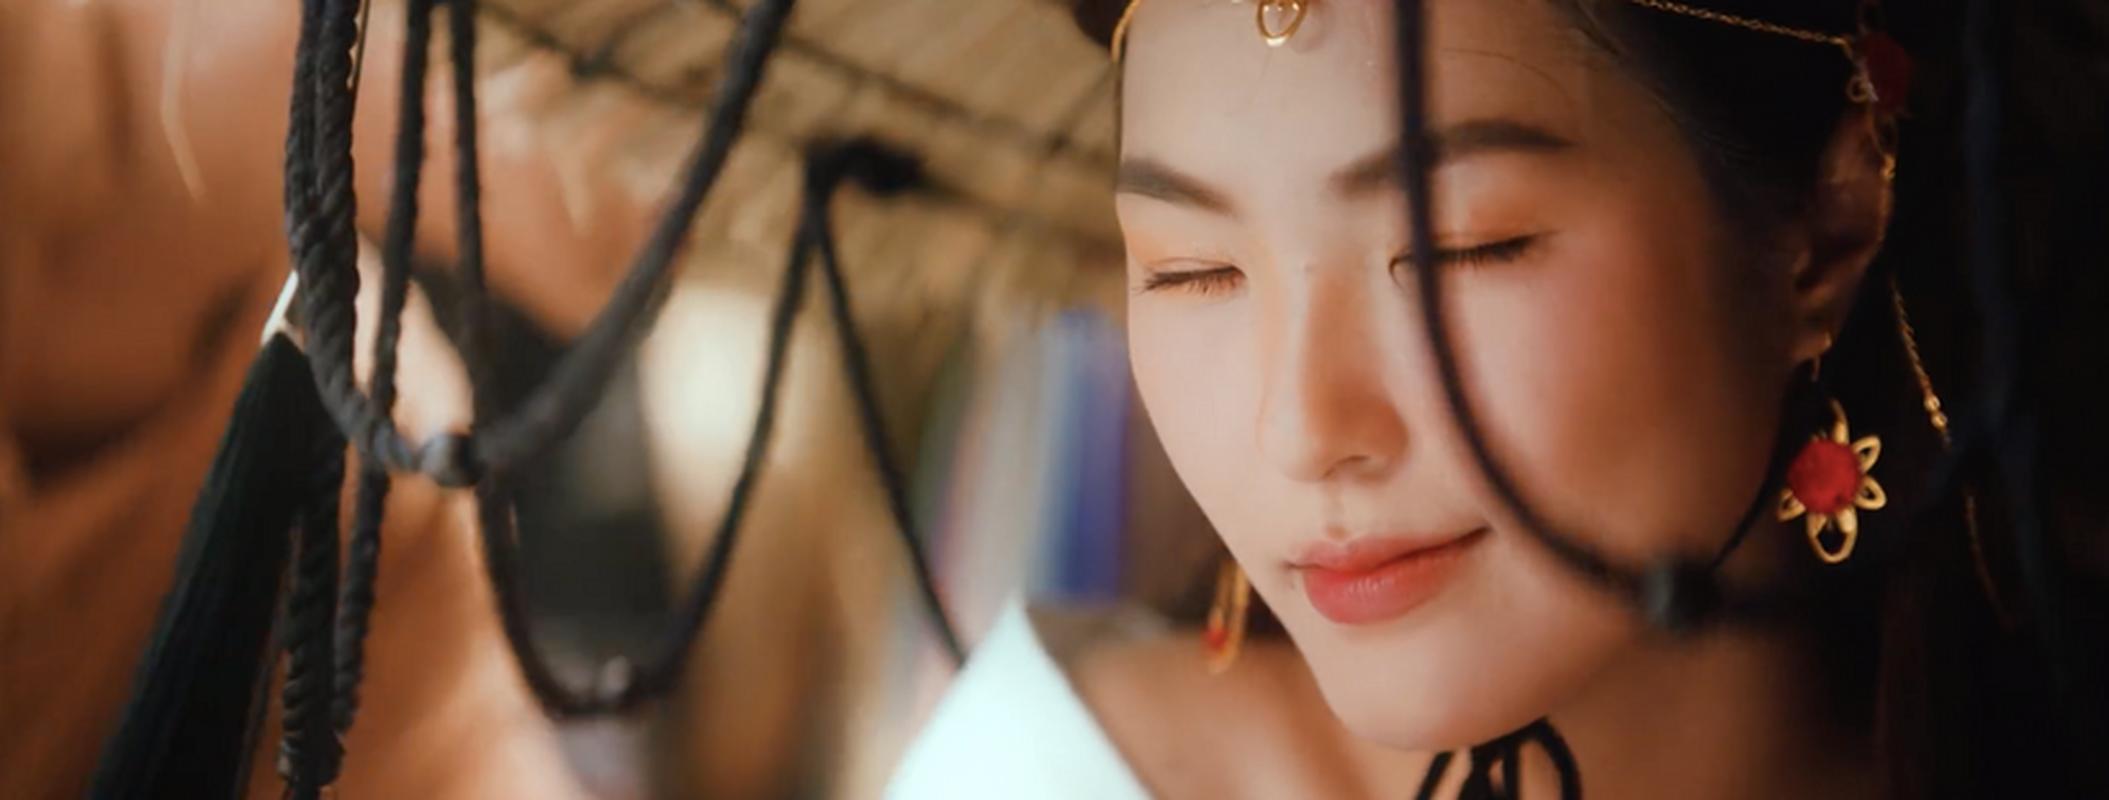 Gai xinh trong MV moi cua Jack khoe anh khi chat ngut troi-Hinh-2